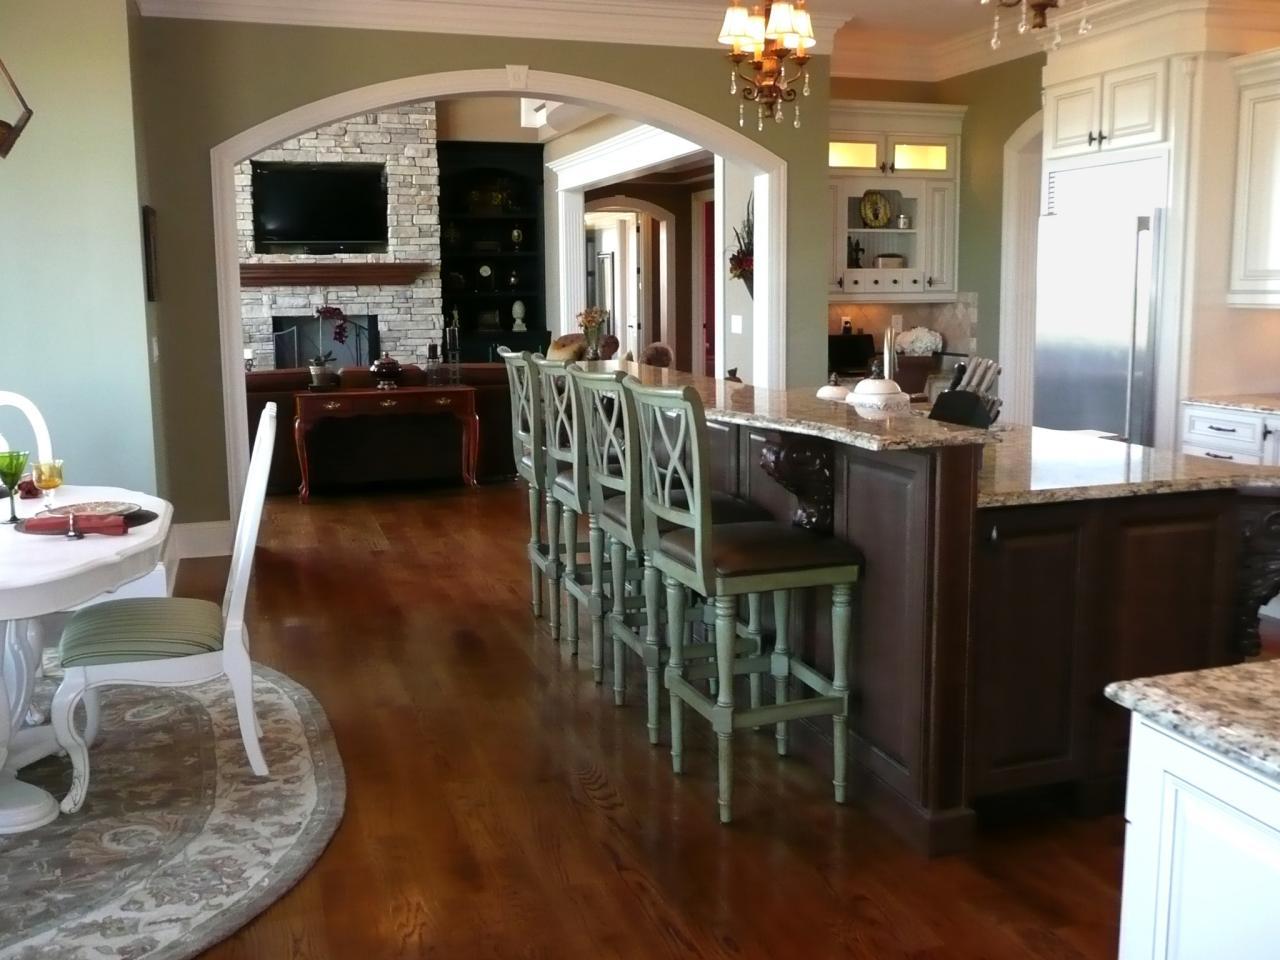 bar stool for kitchen island kitchen islands with stools JJFLPXU